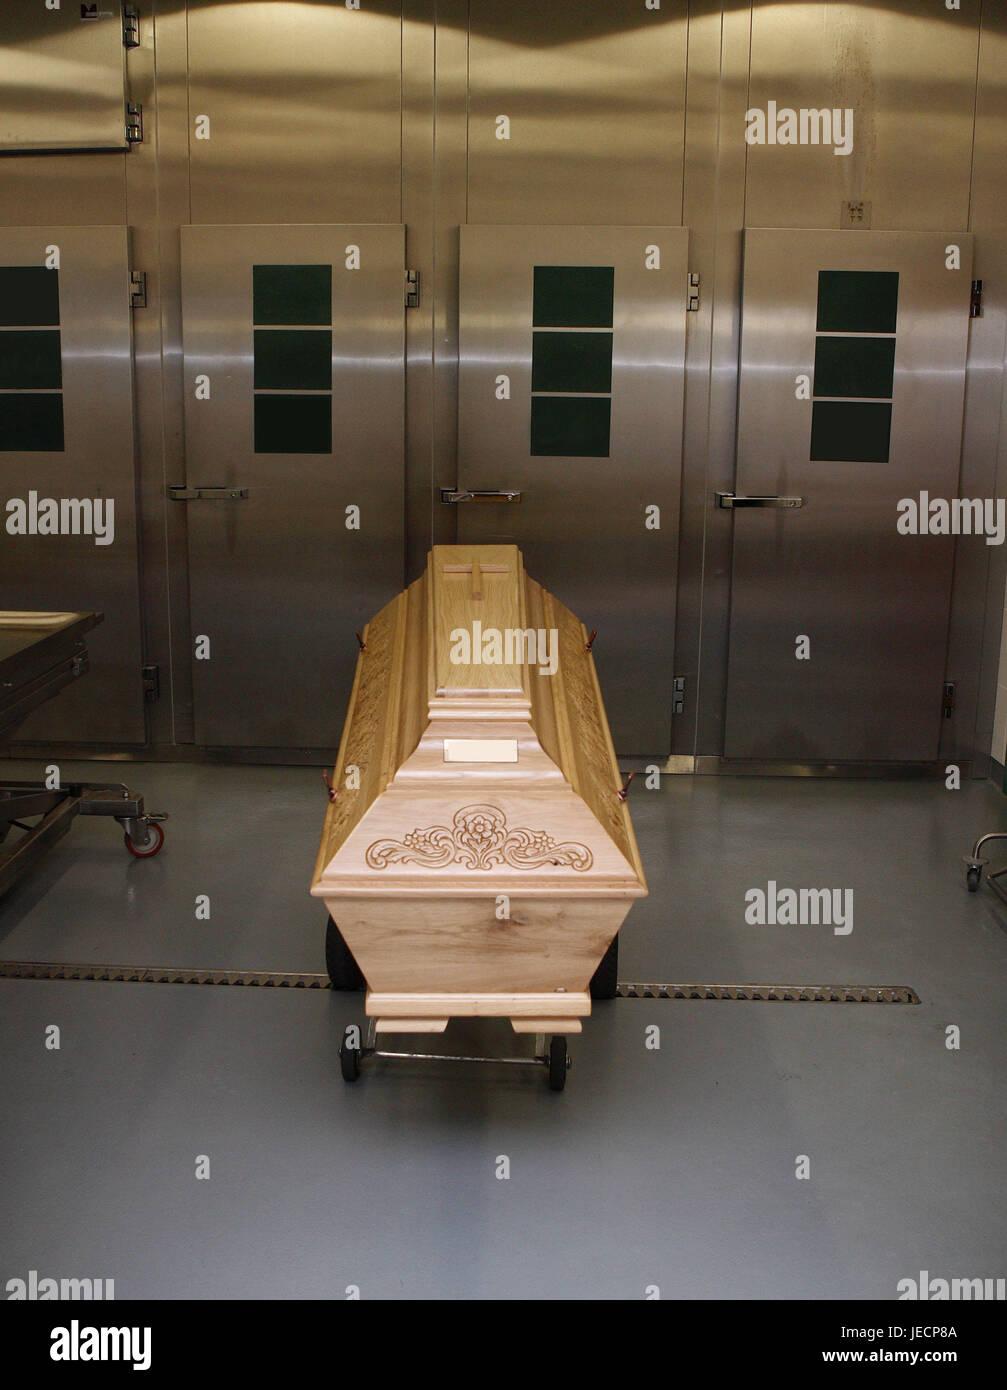 Hospital, pathological-anatomical department, Prosektur, coffin, medicine, hospital department, morgue, cooling, Stock Photo